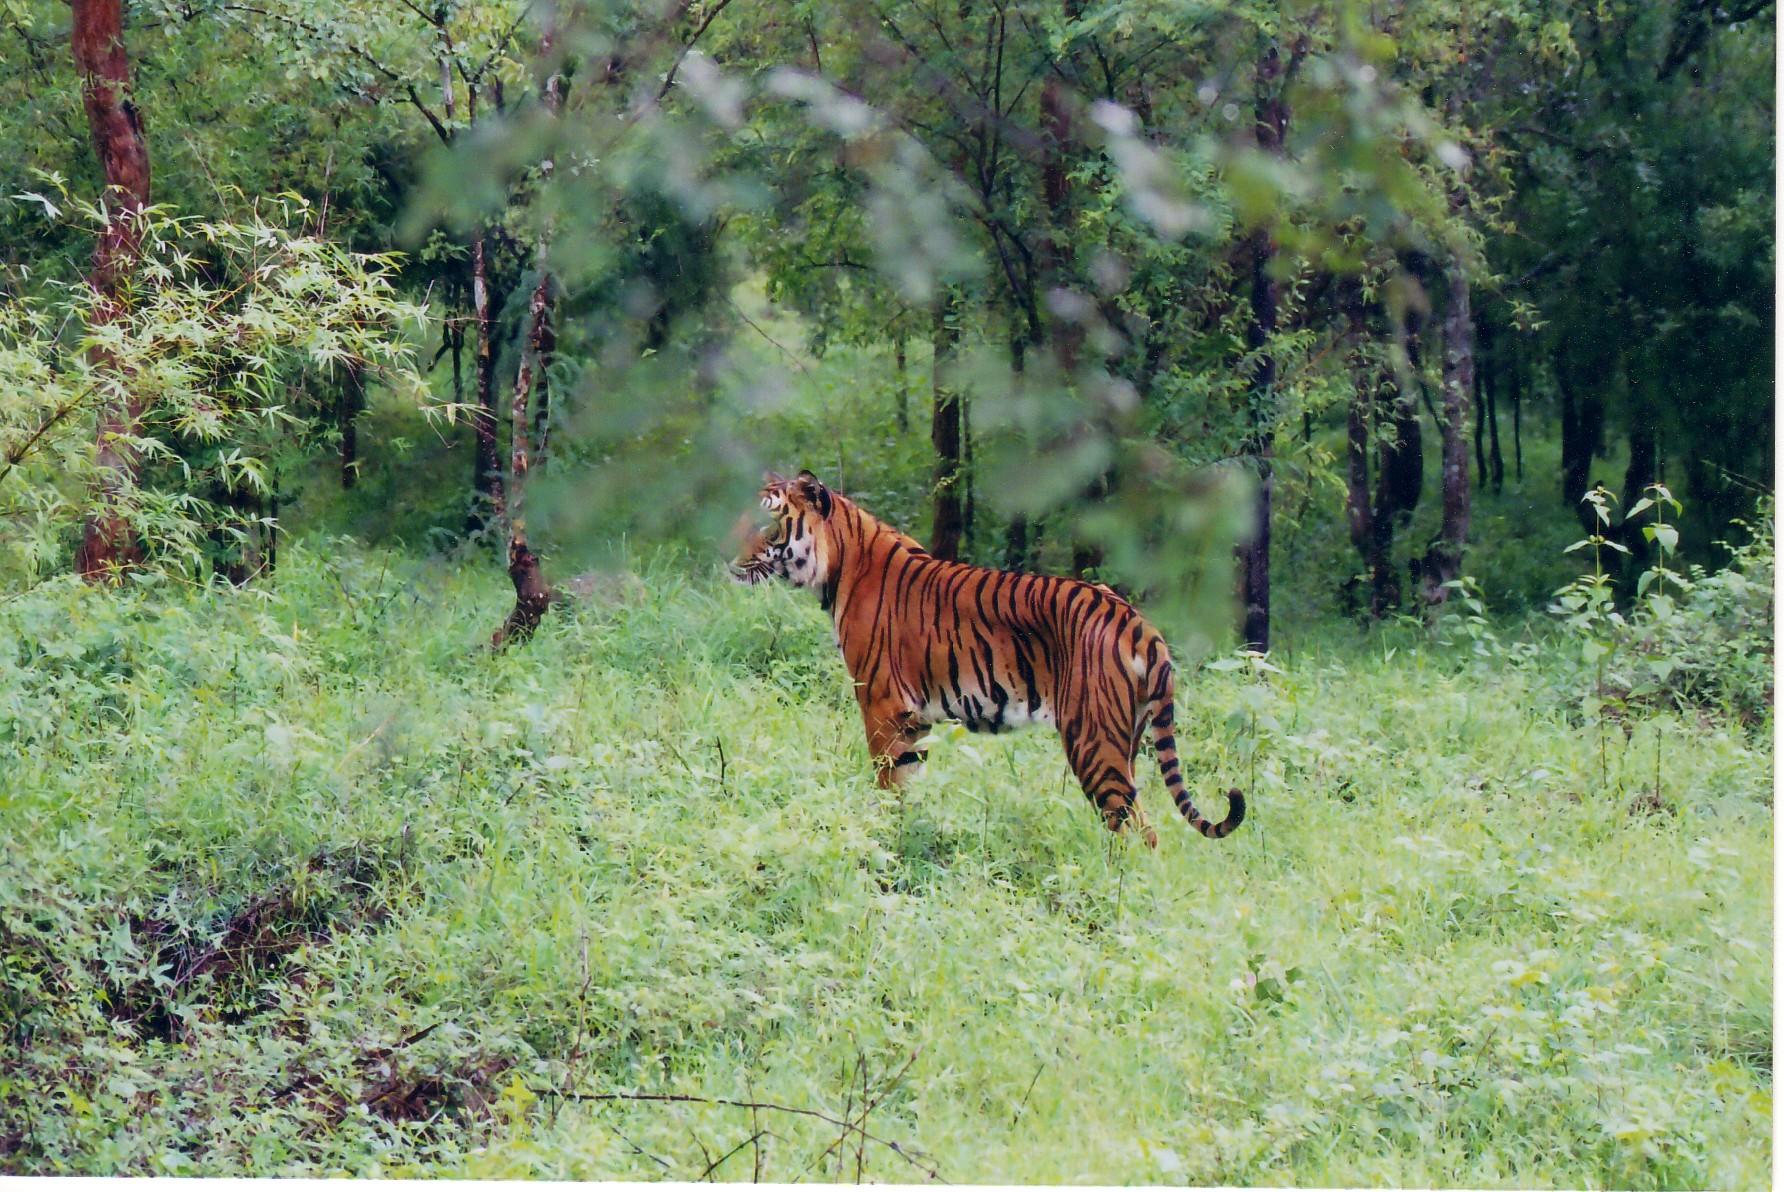 An Indian tiger at Bhadra wildlife Sanctuary